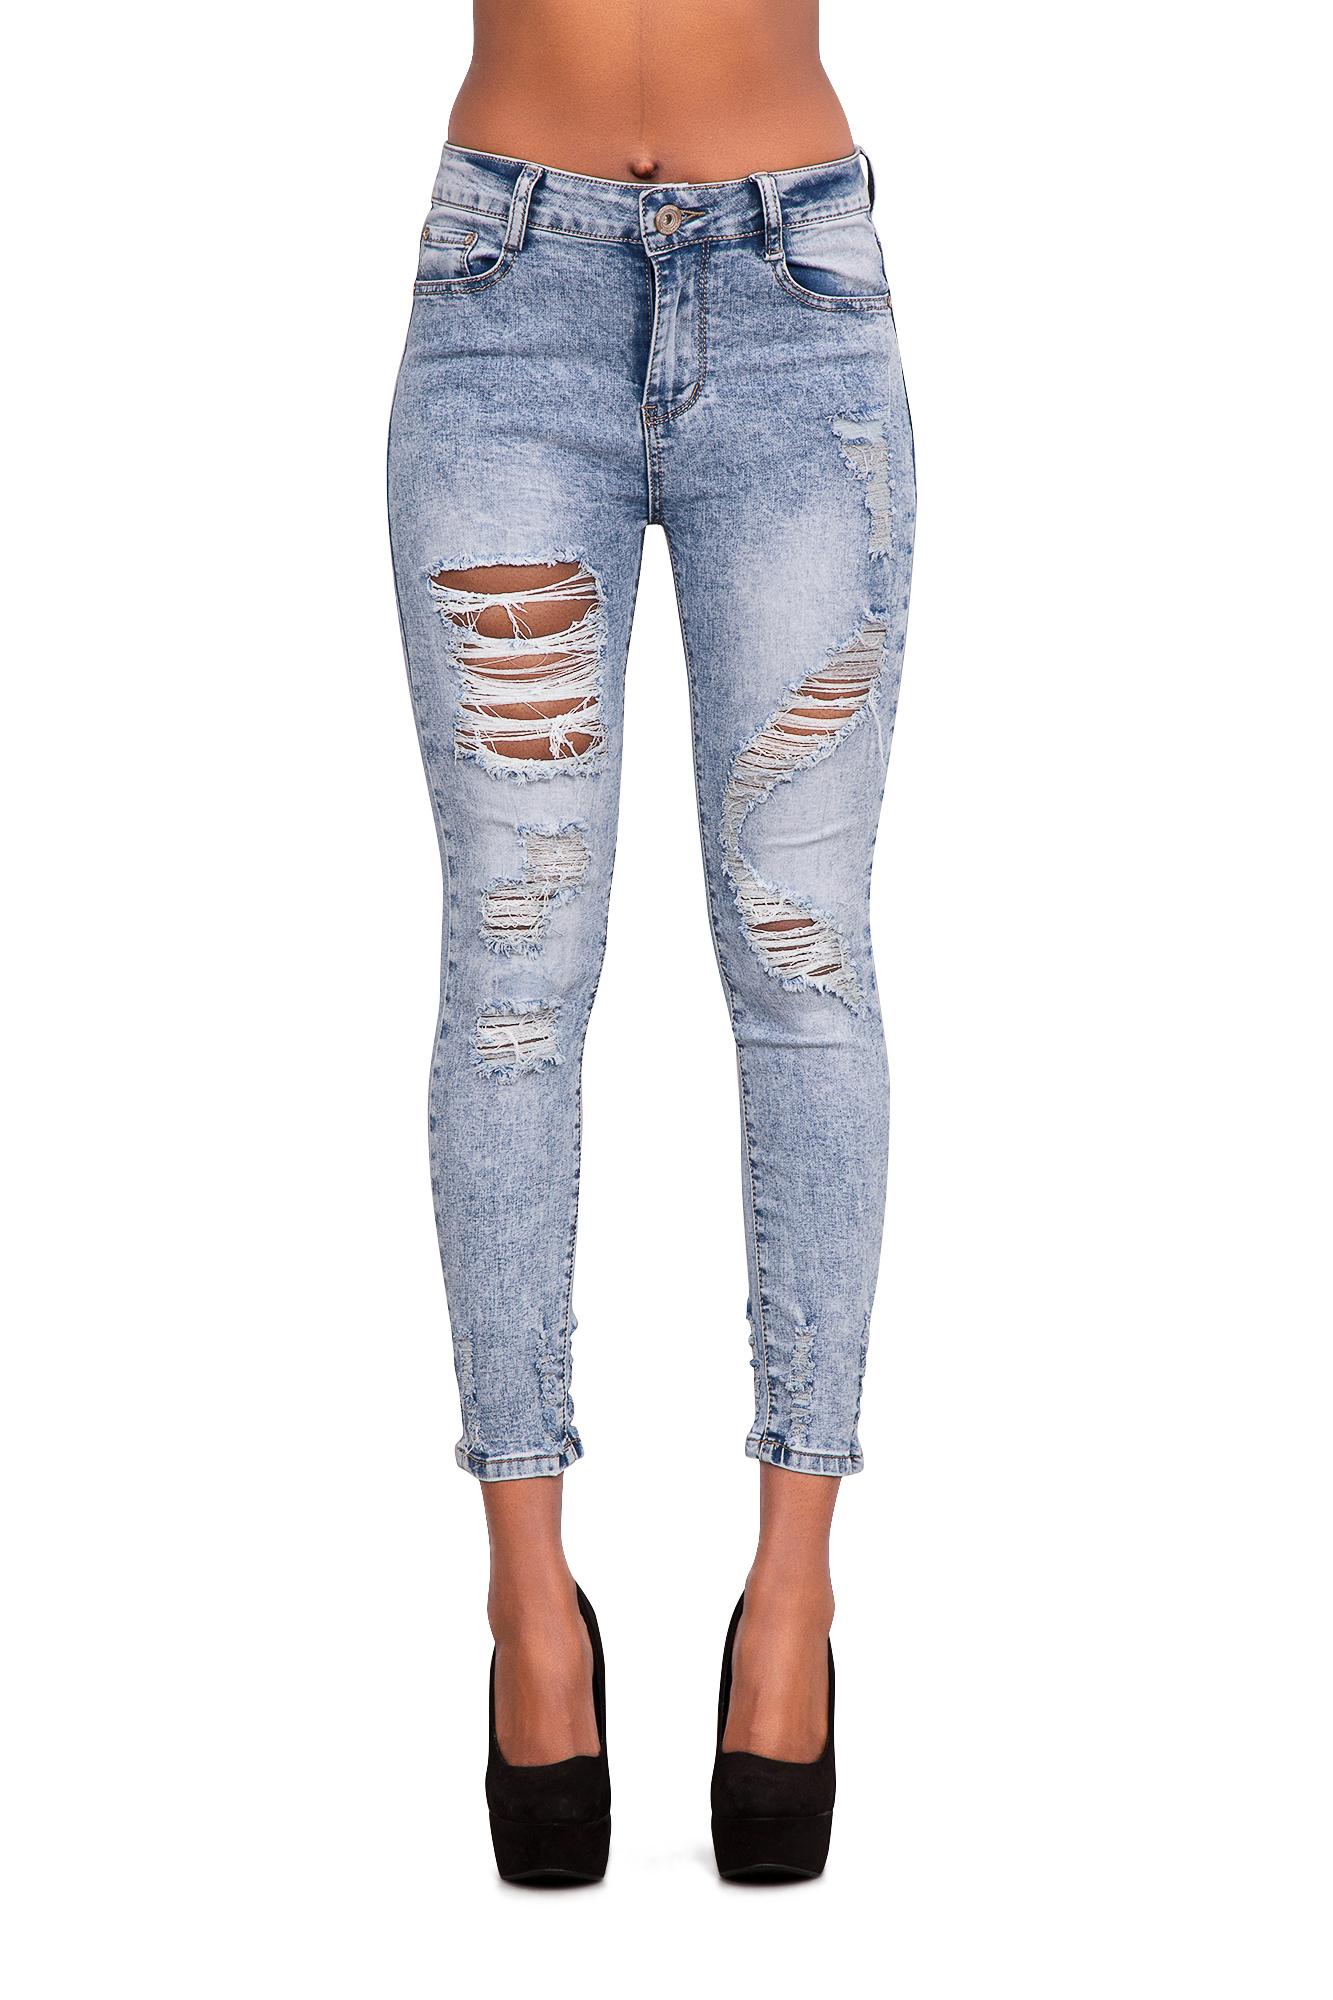 Womens-Ladies-Jeans-Ripped-Slim-Fit-Sexy-Slim-Skinny-Acid-Wash-Denim-Size-6-14